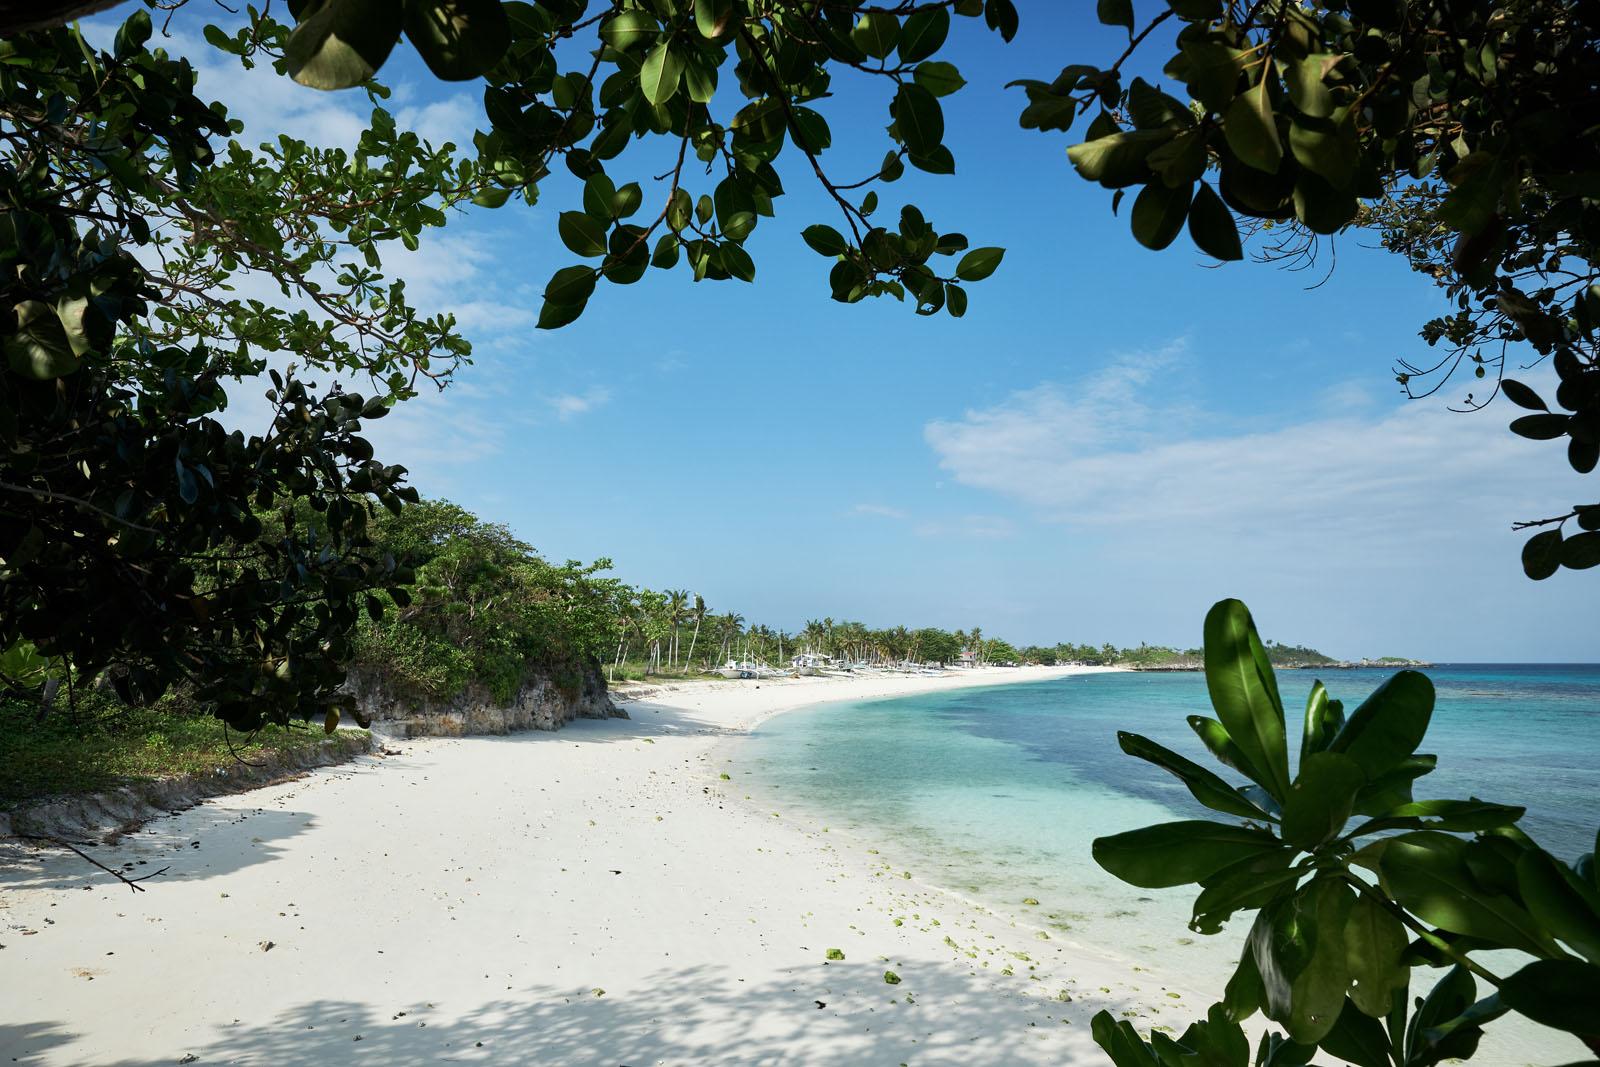 an idyllic shoreline on Malapascua Island, Cebu